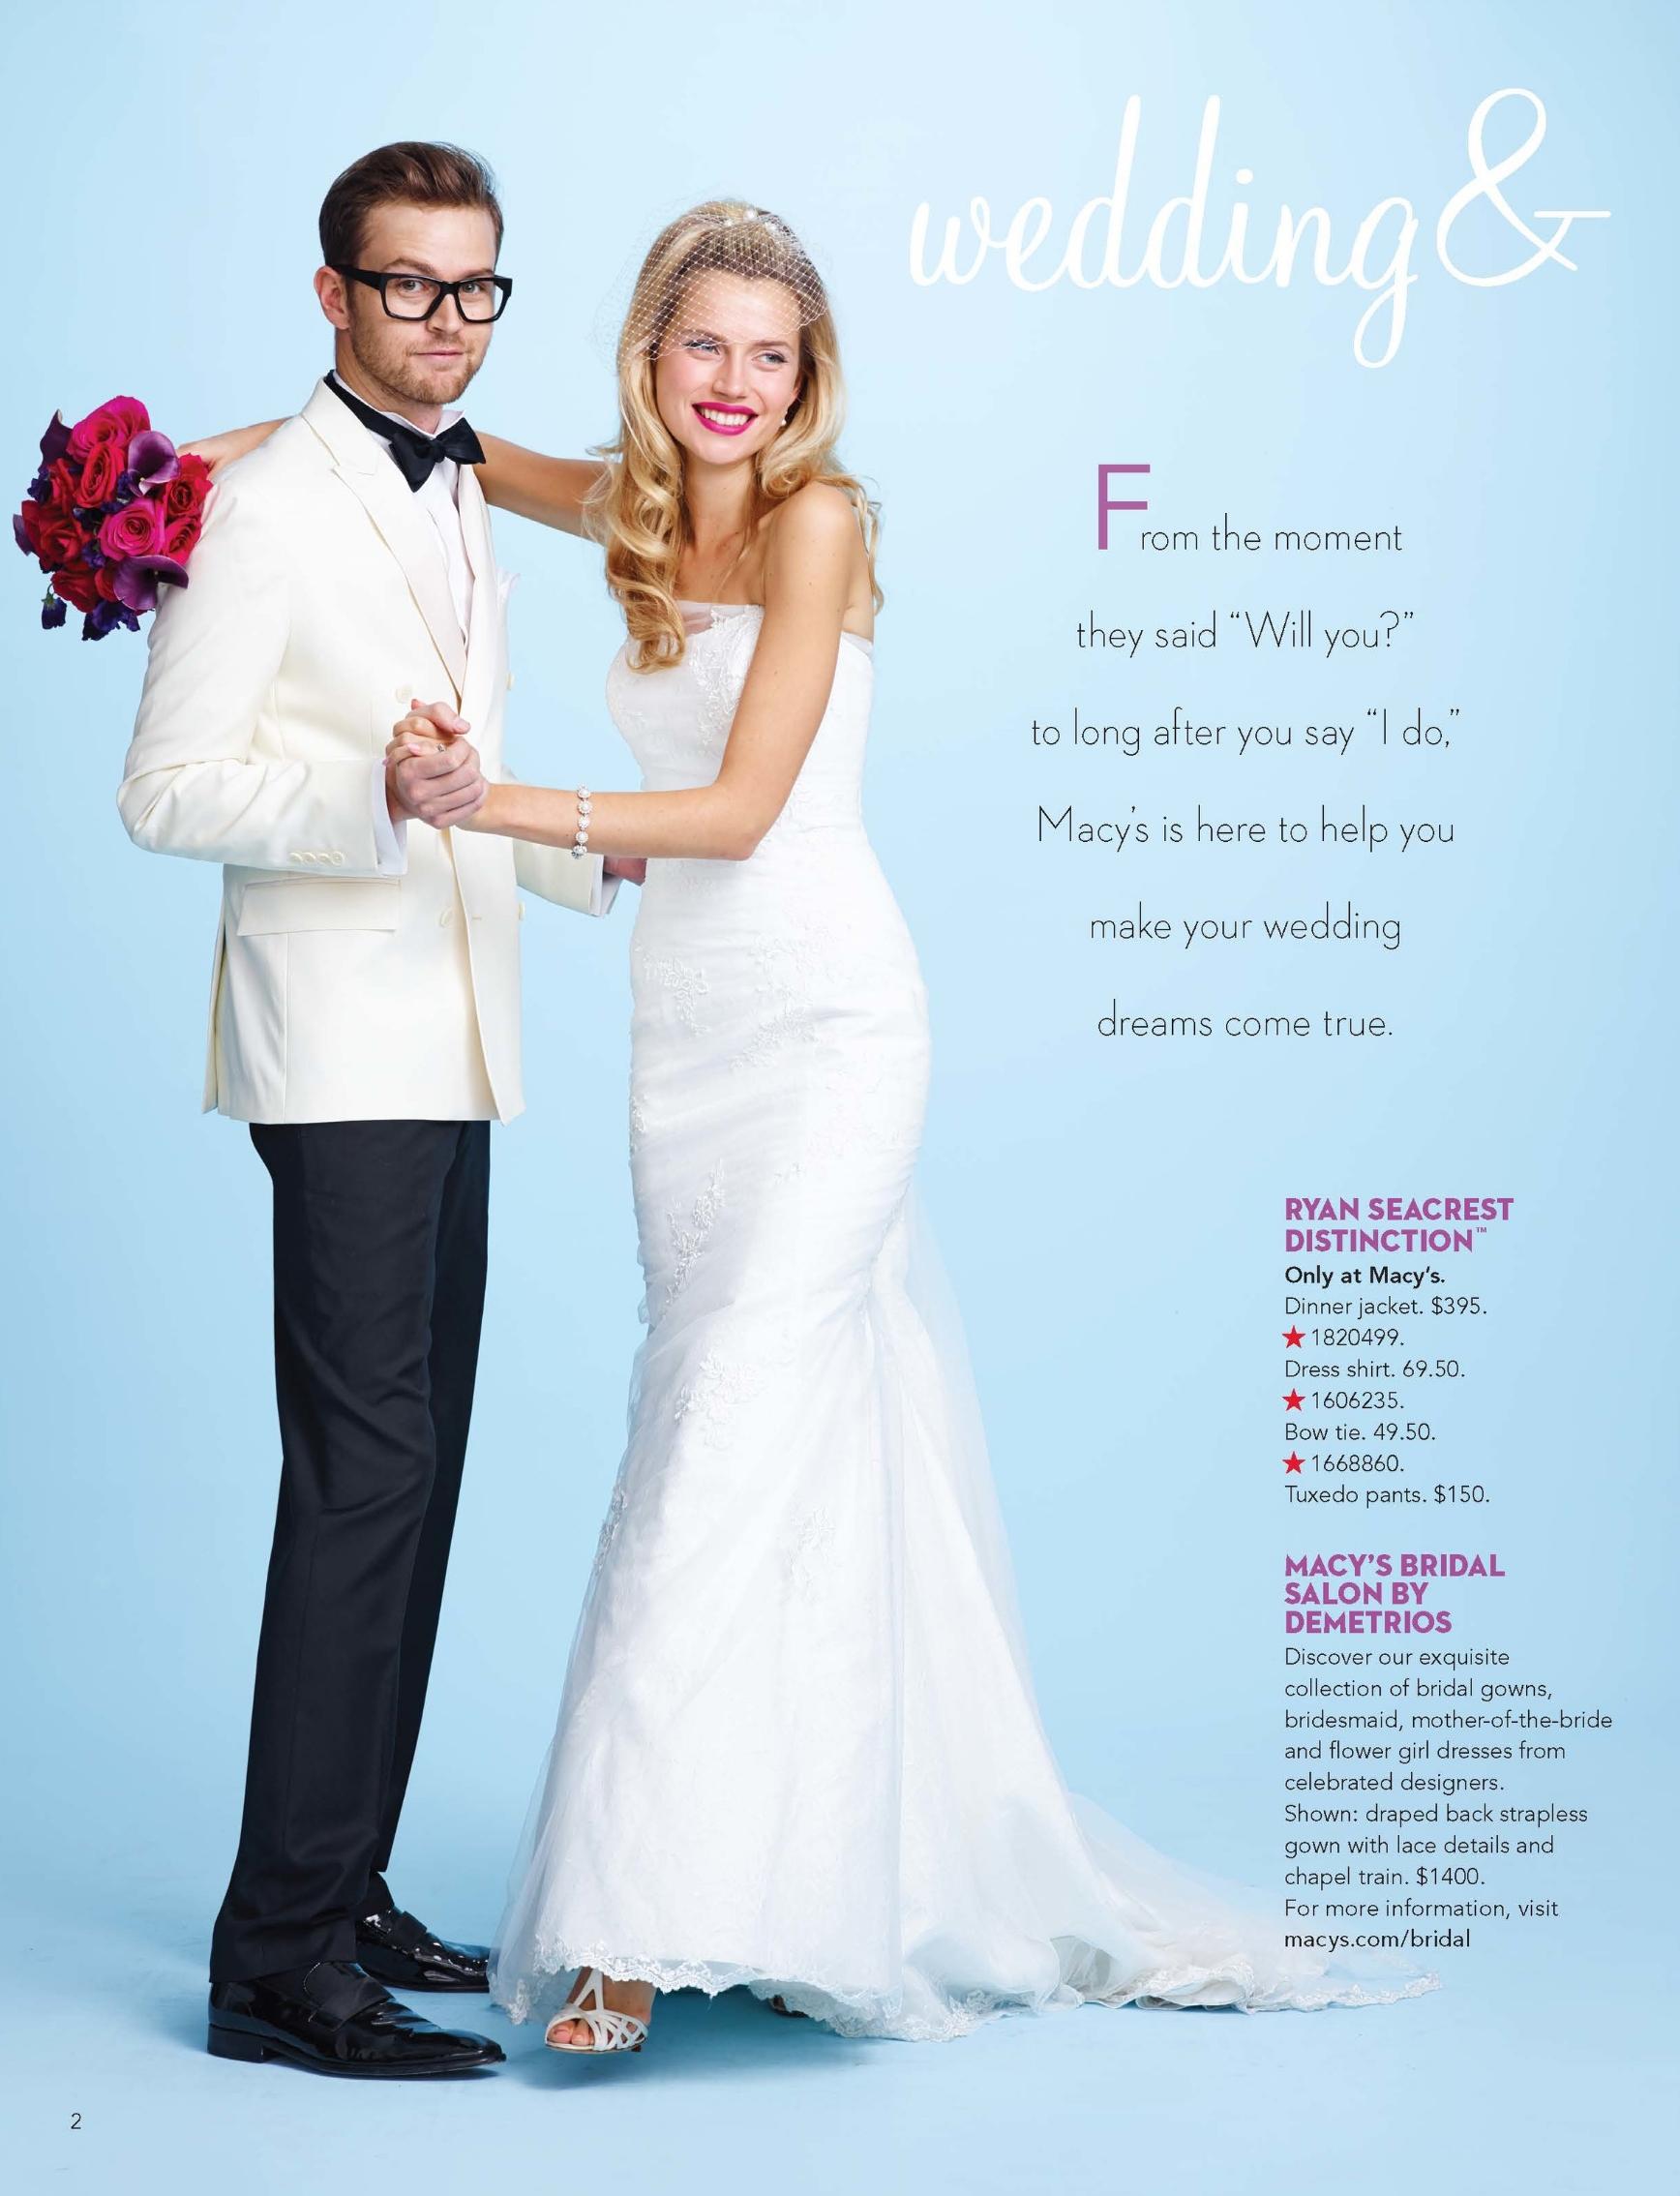 Macy S Wedding Dresses.Macys Wedding Dresses Bridal Gowns Lixnet Ag